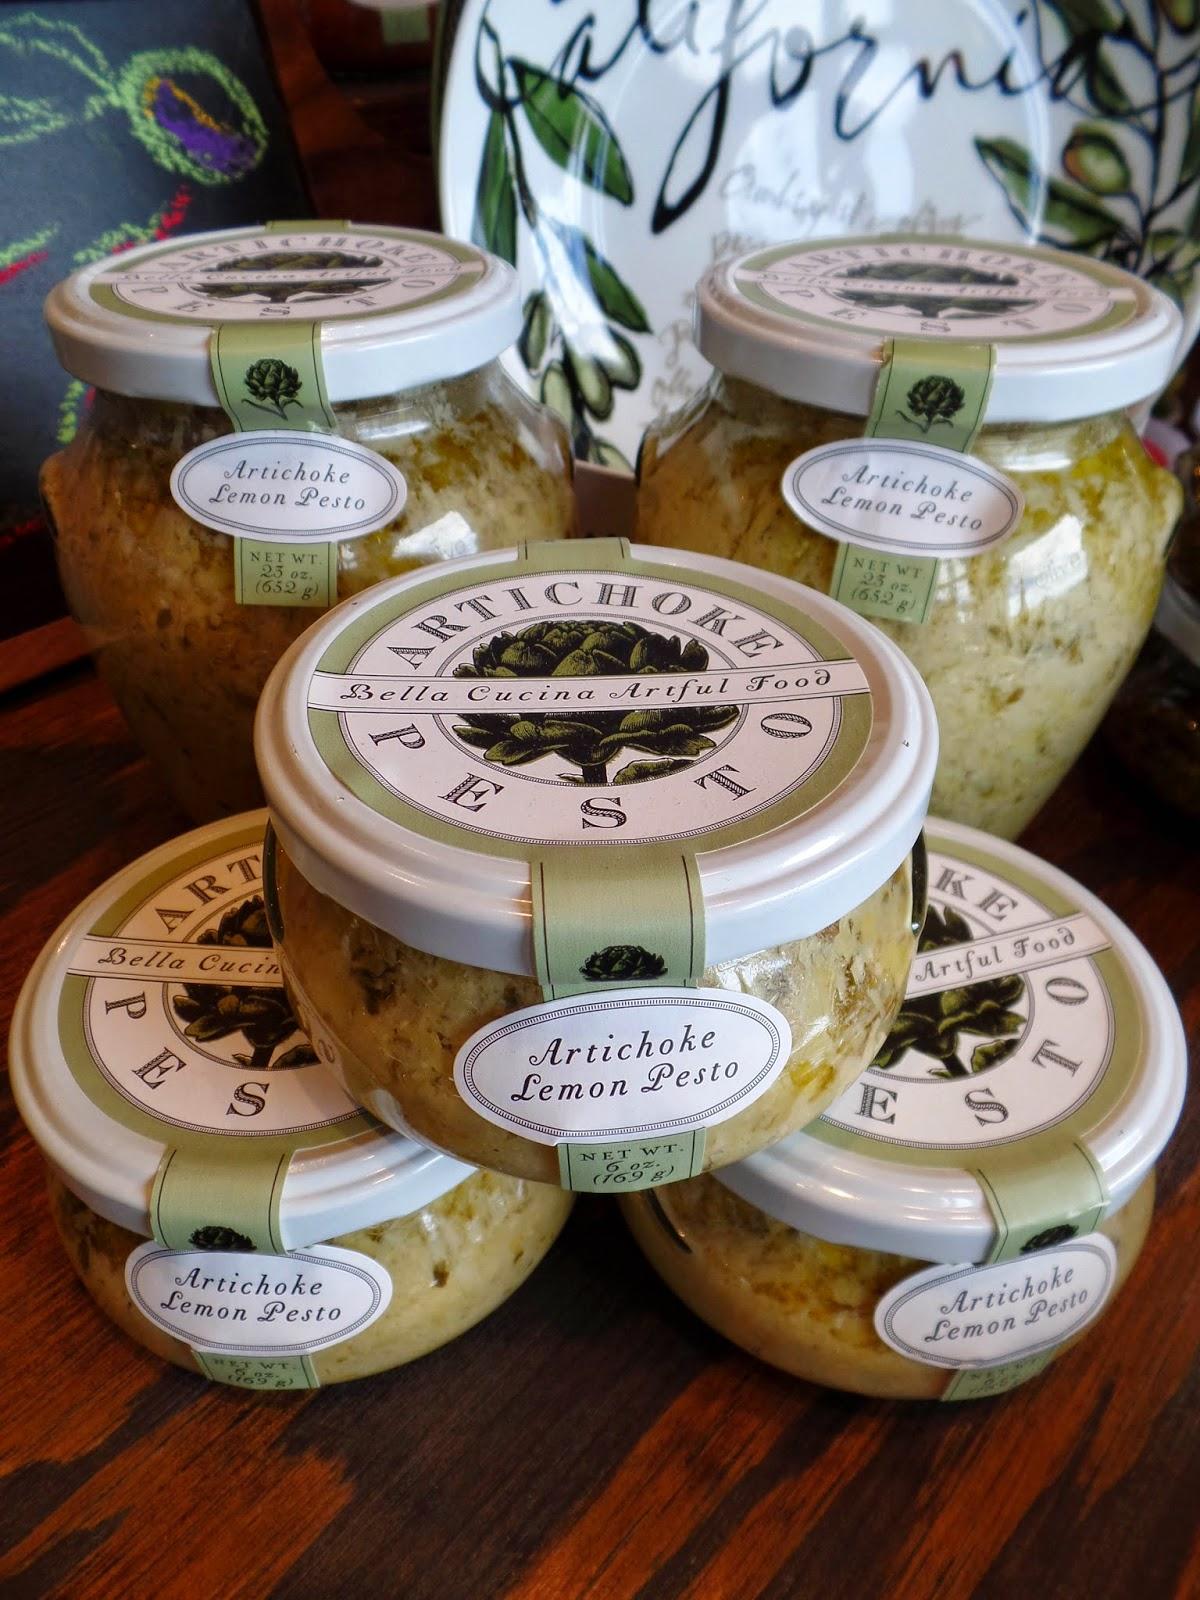 We Olive Bella Cucina Artichoke Lemon Pesto.jpg